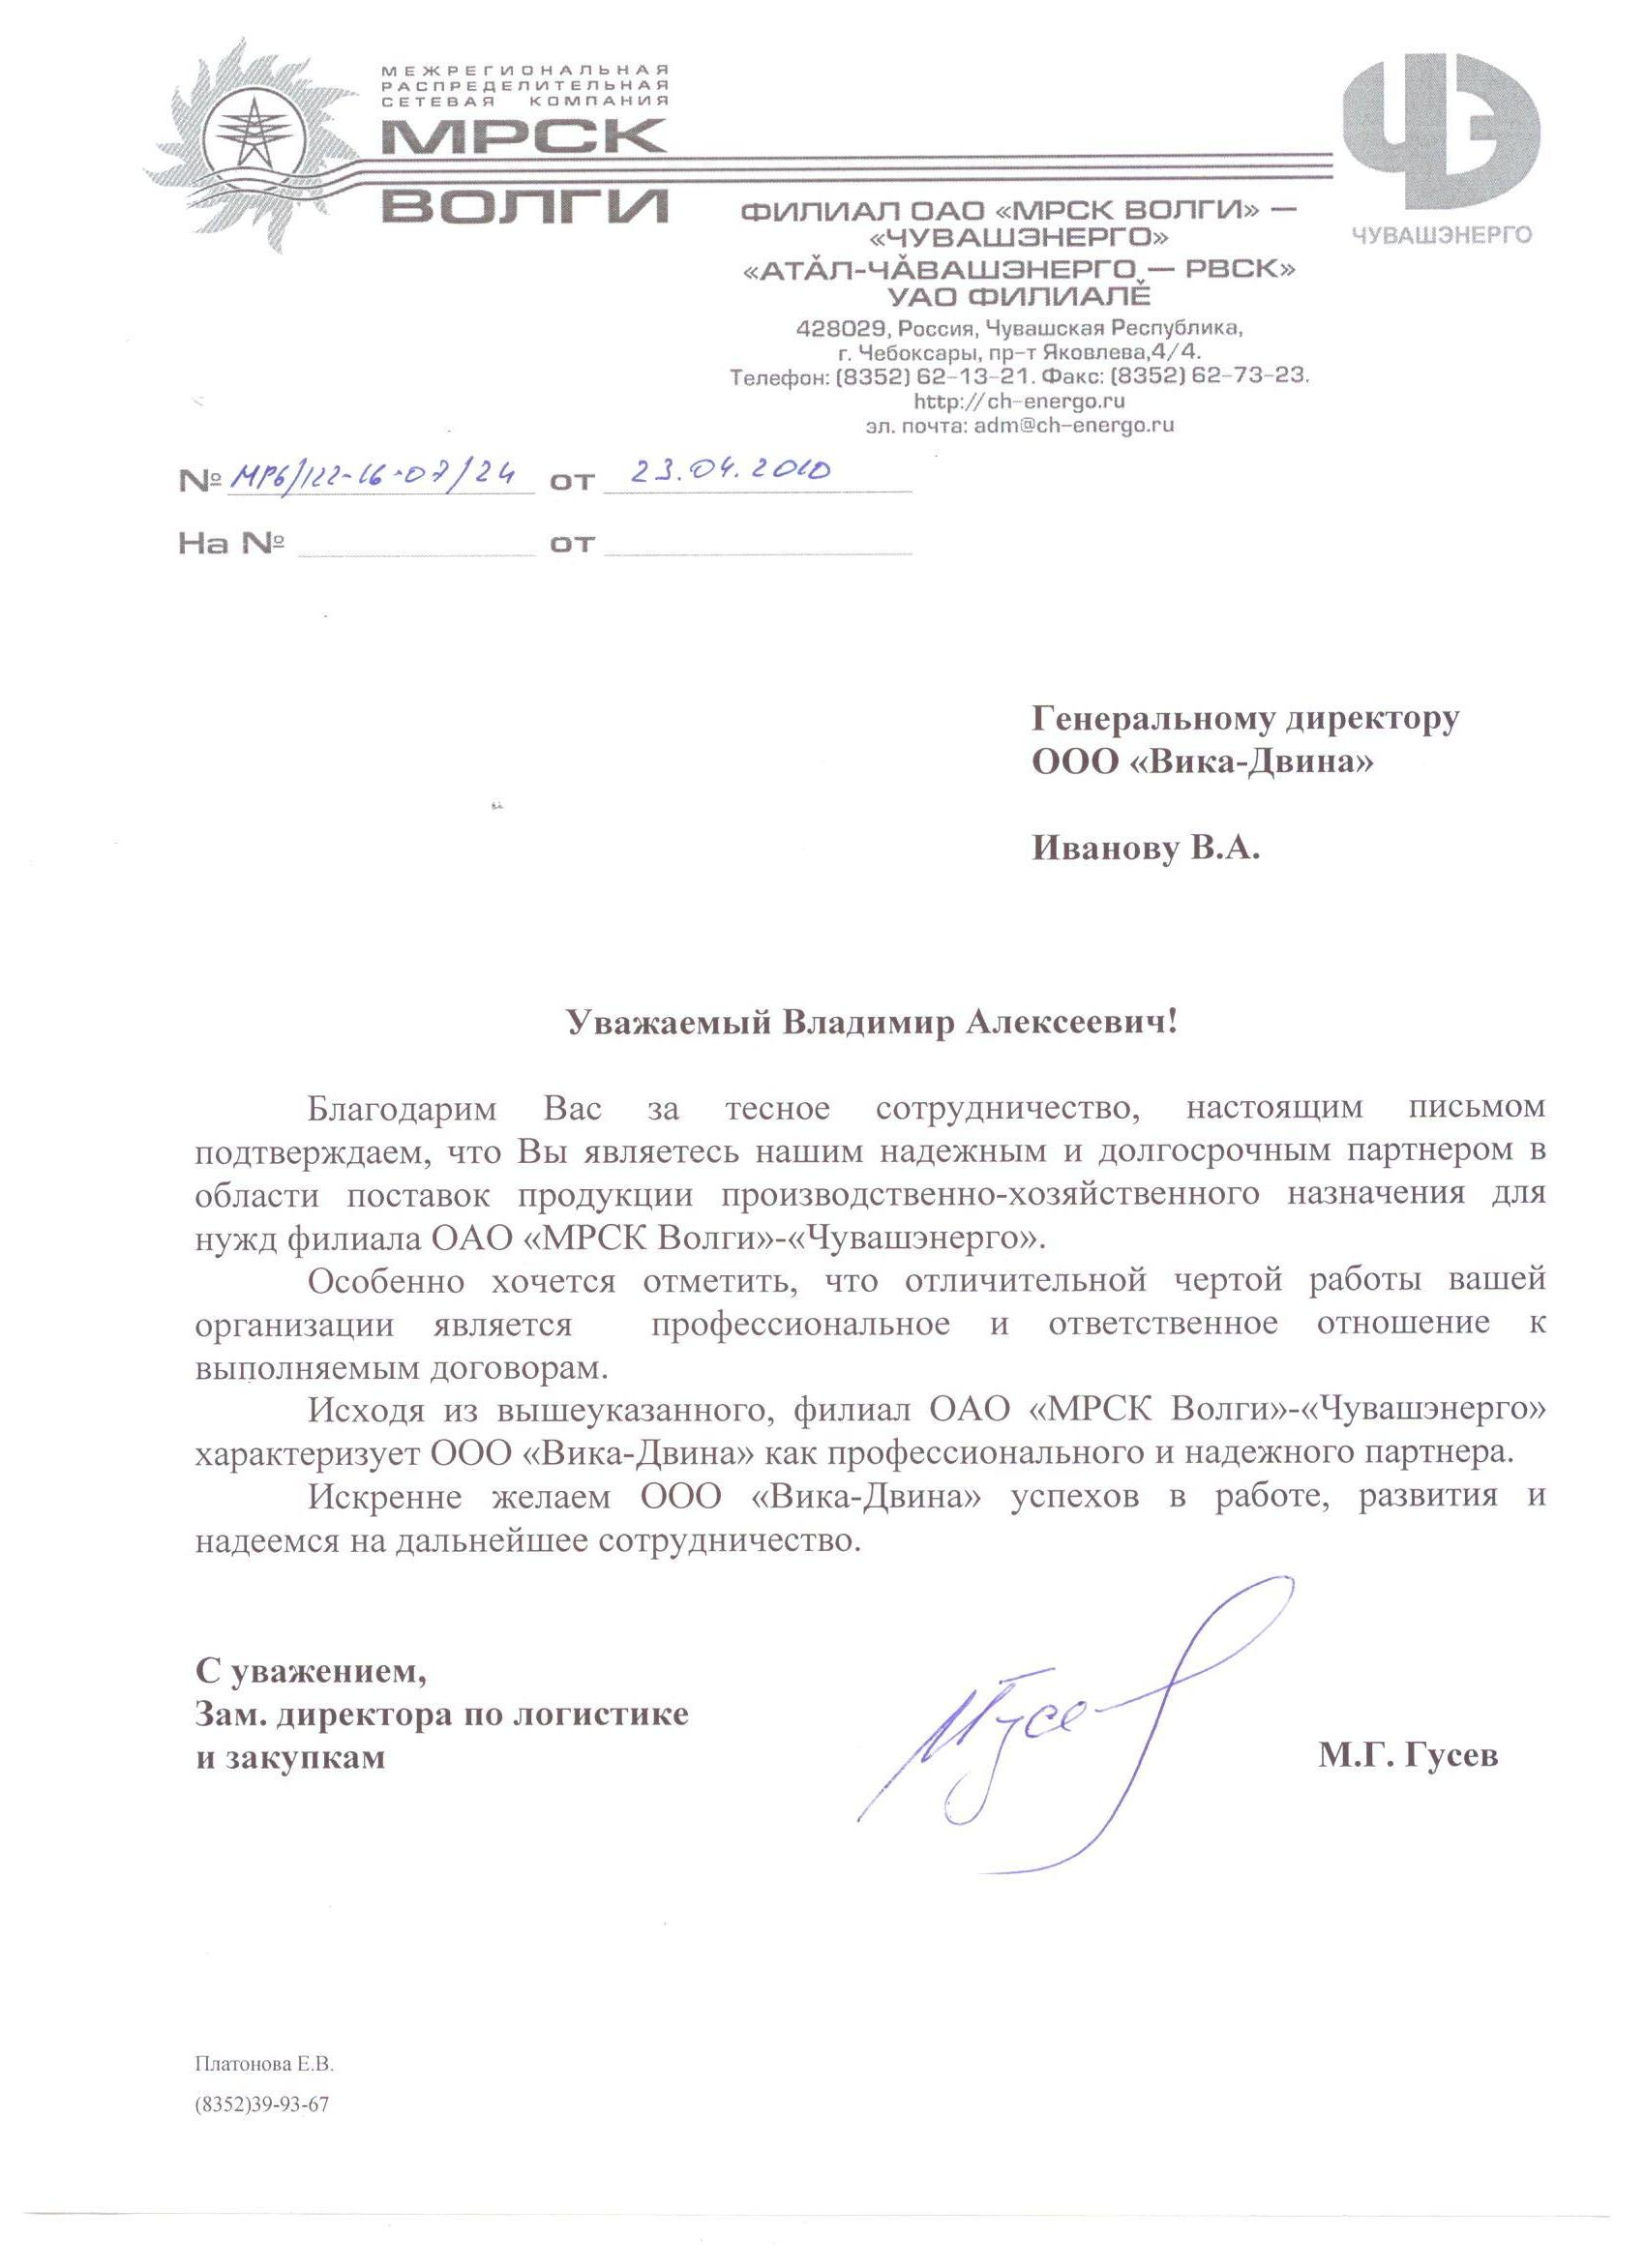 Филиал ОАО «МРСК Волги» — «Чувашэнерго»